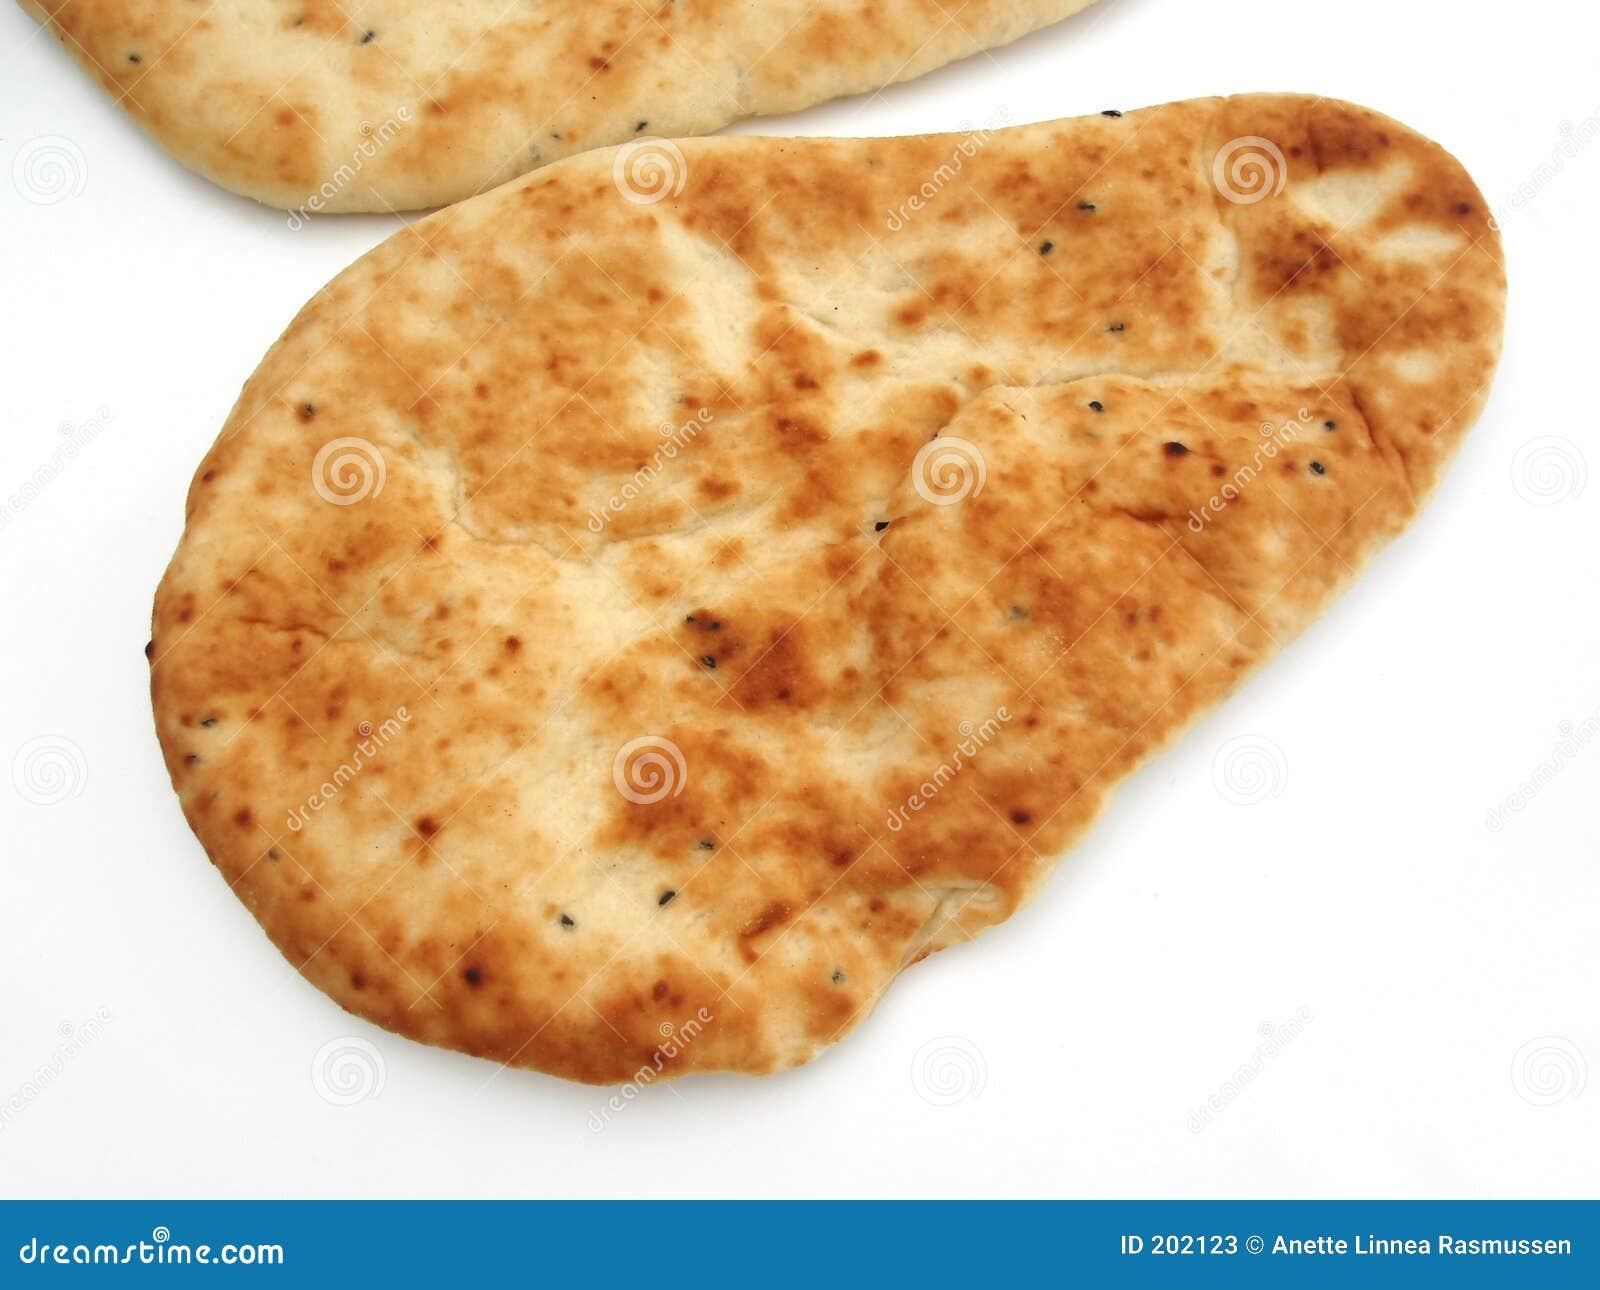 Handmade Turkish bread